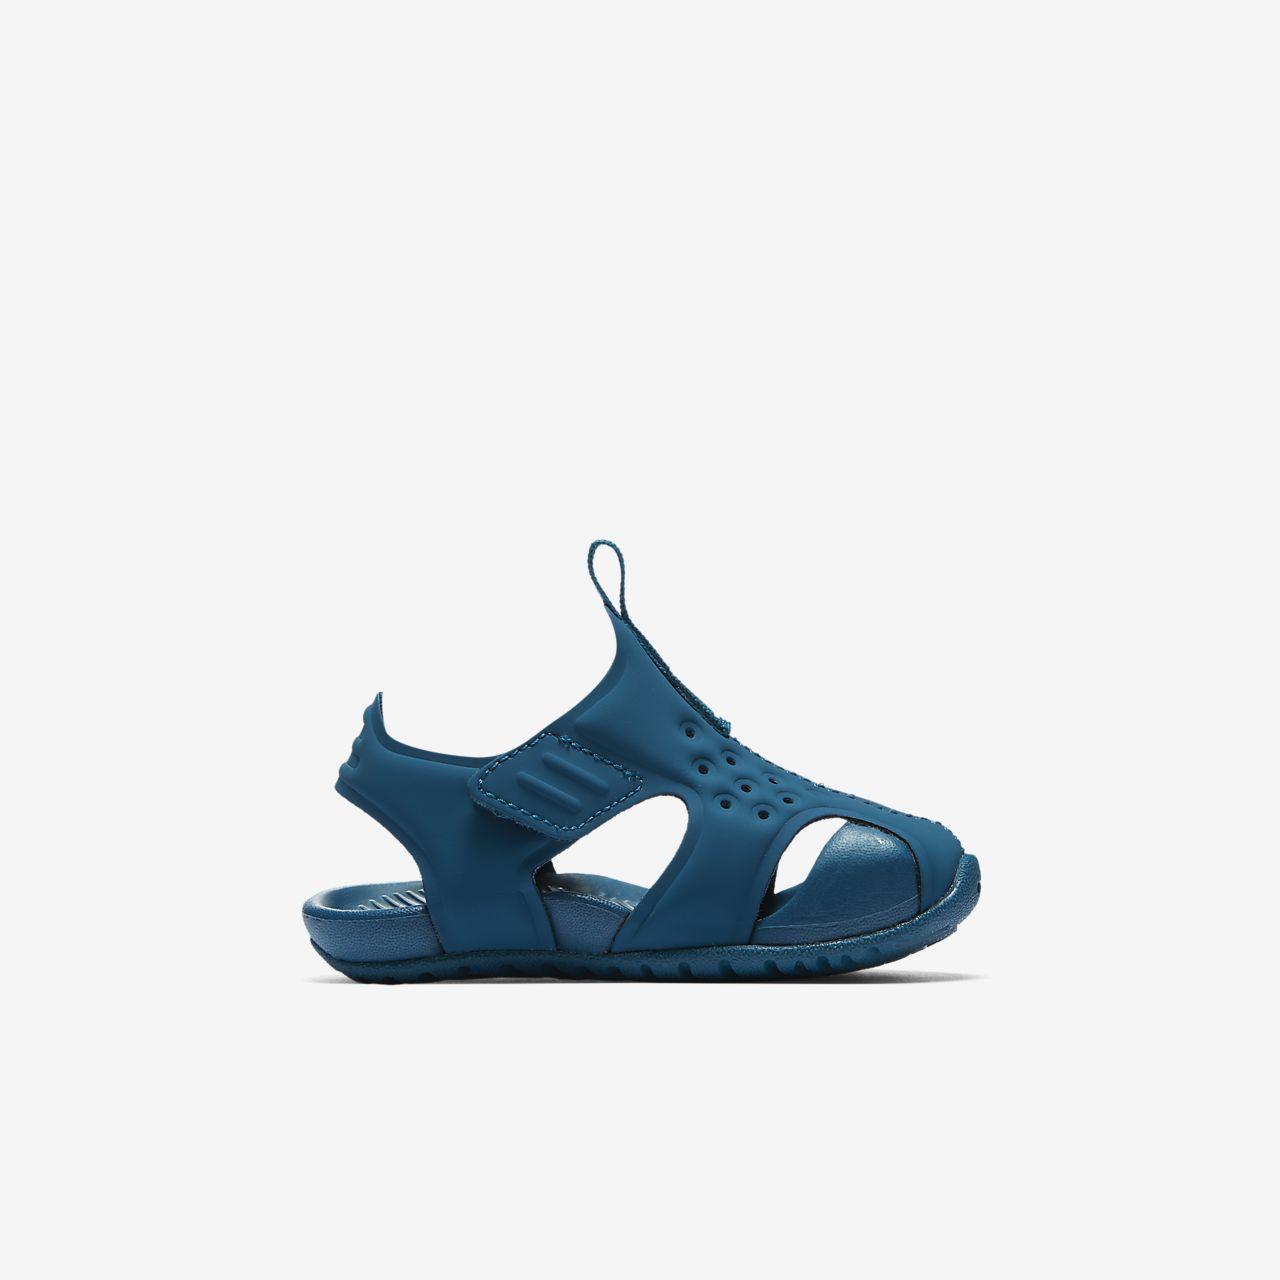 Toddler Sandal. Nike SG